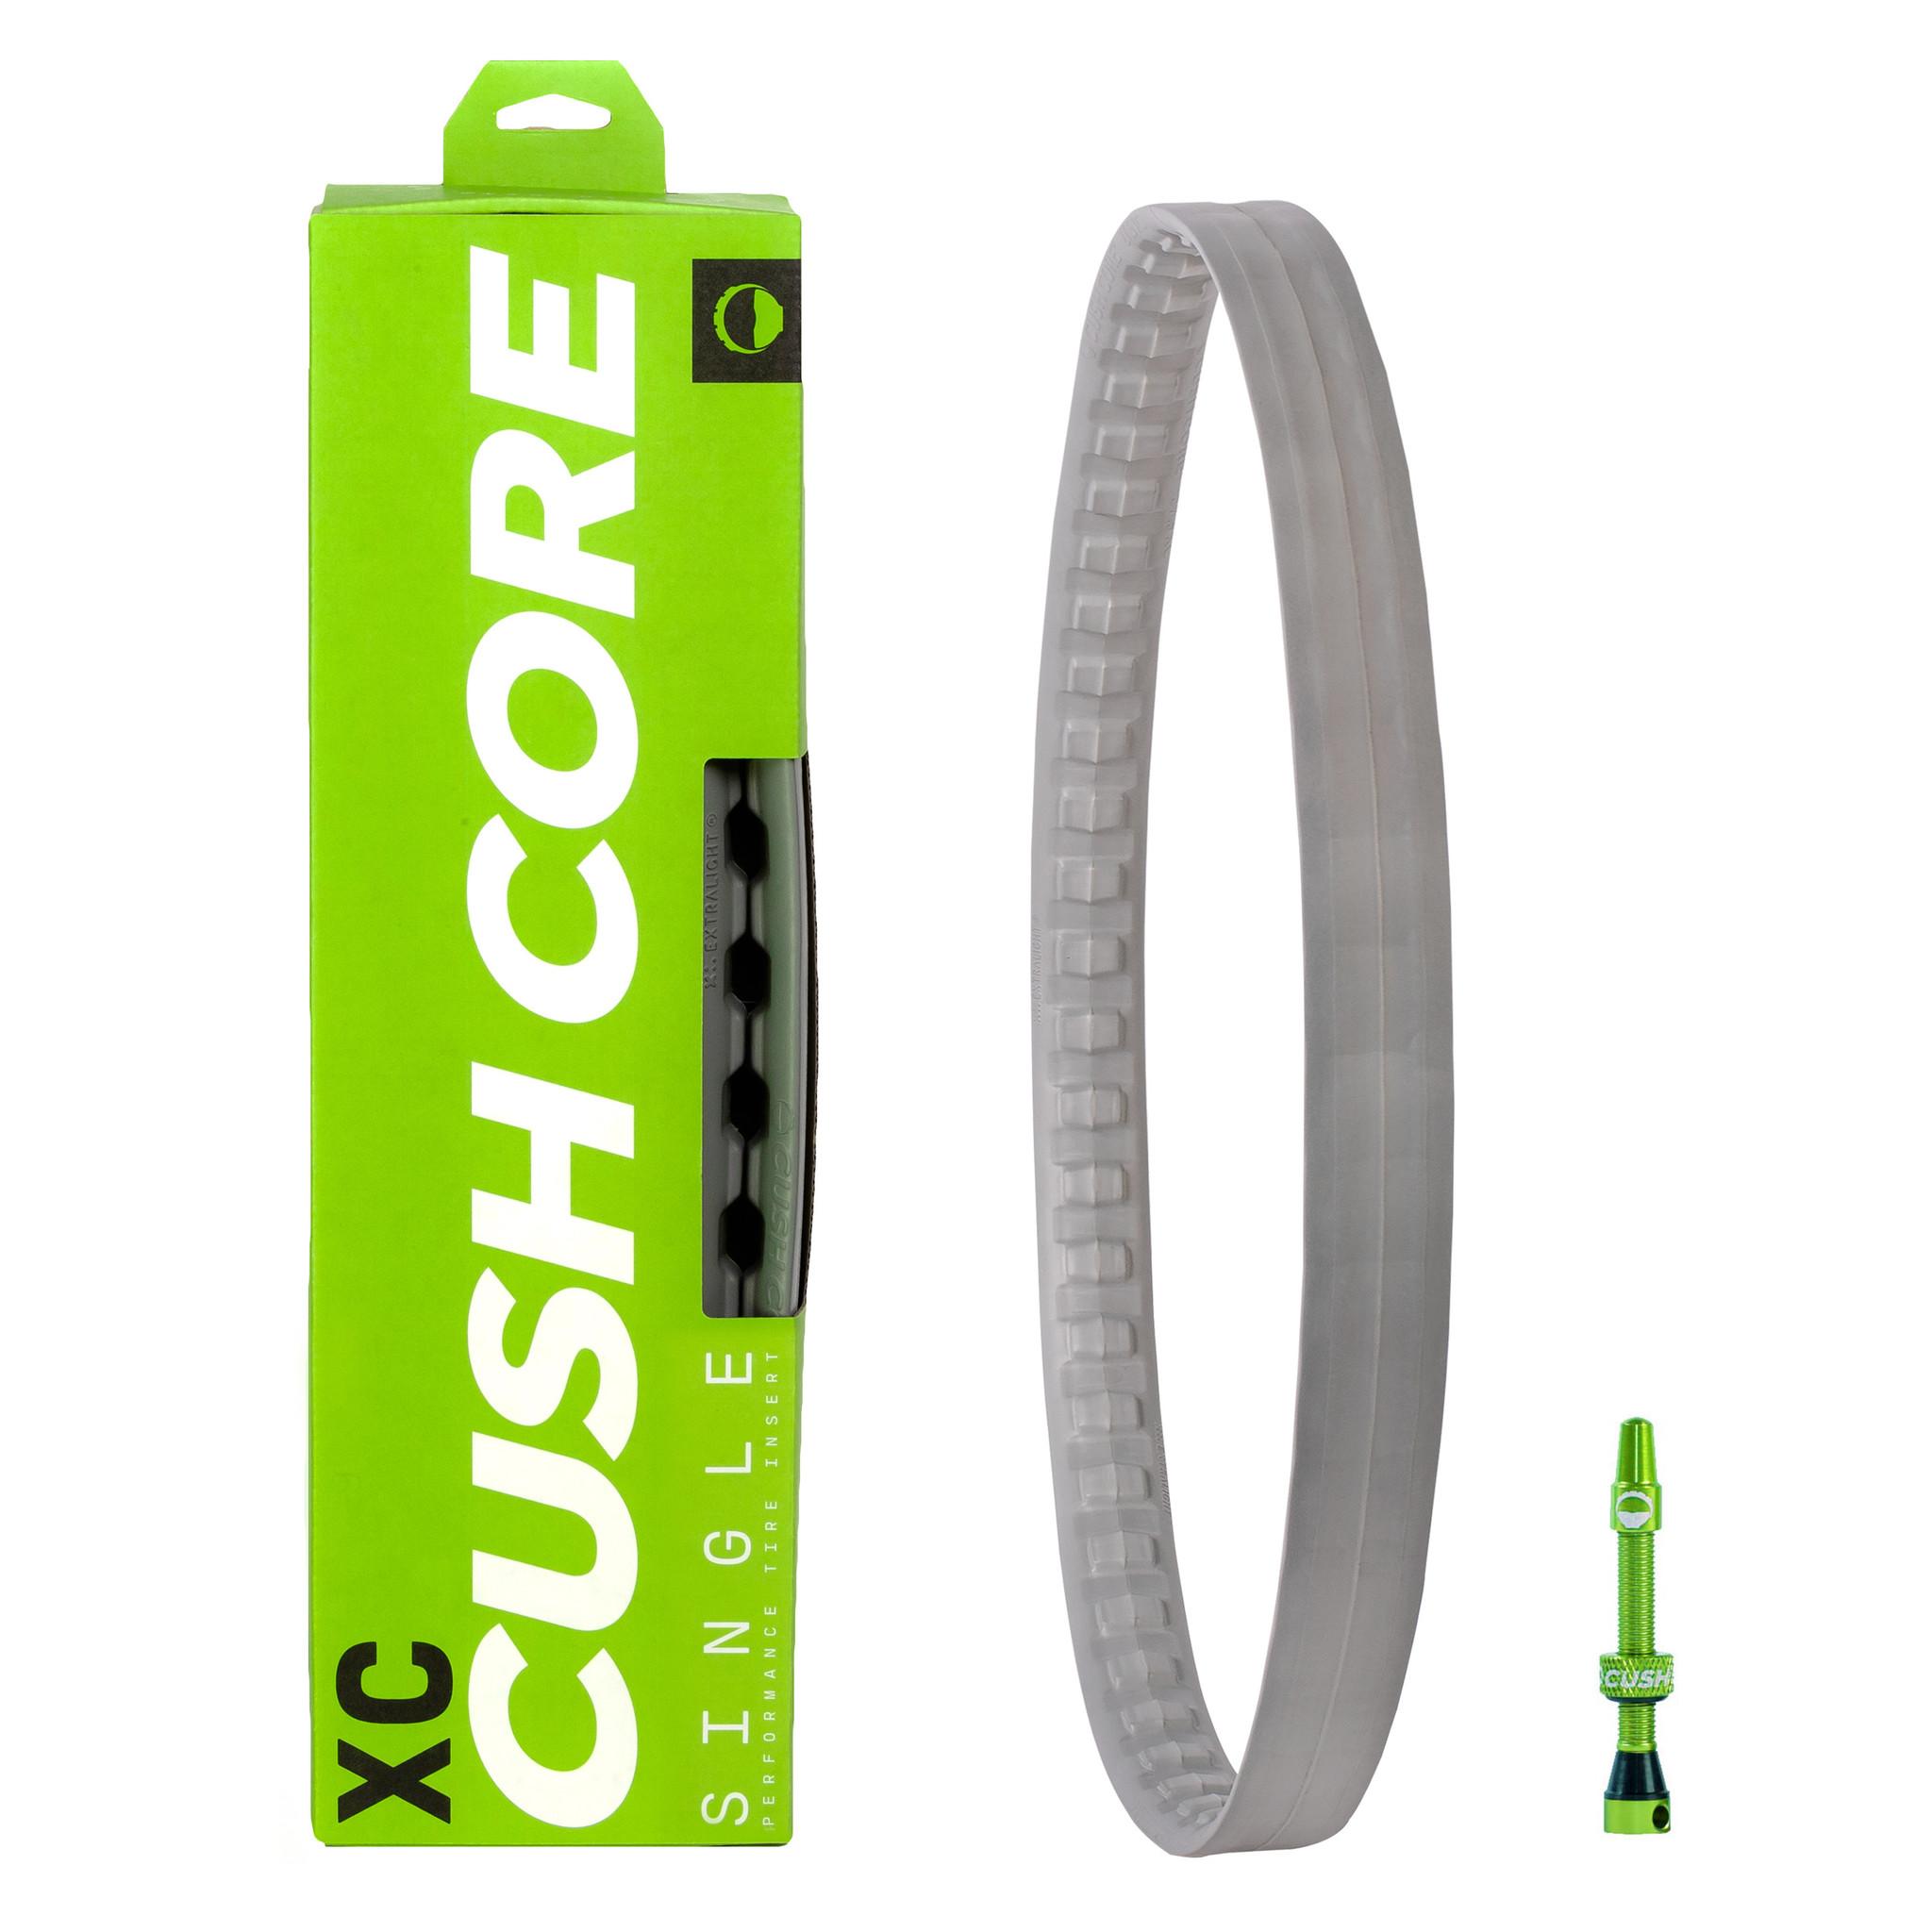 "CushCore CushCore Tubeless Tire Insert (Single) - XC 29"" (With Valve)"